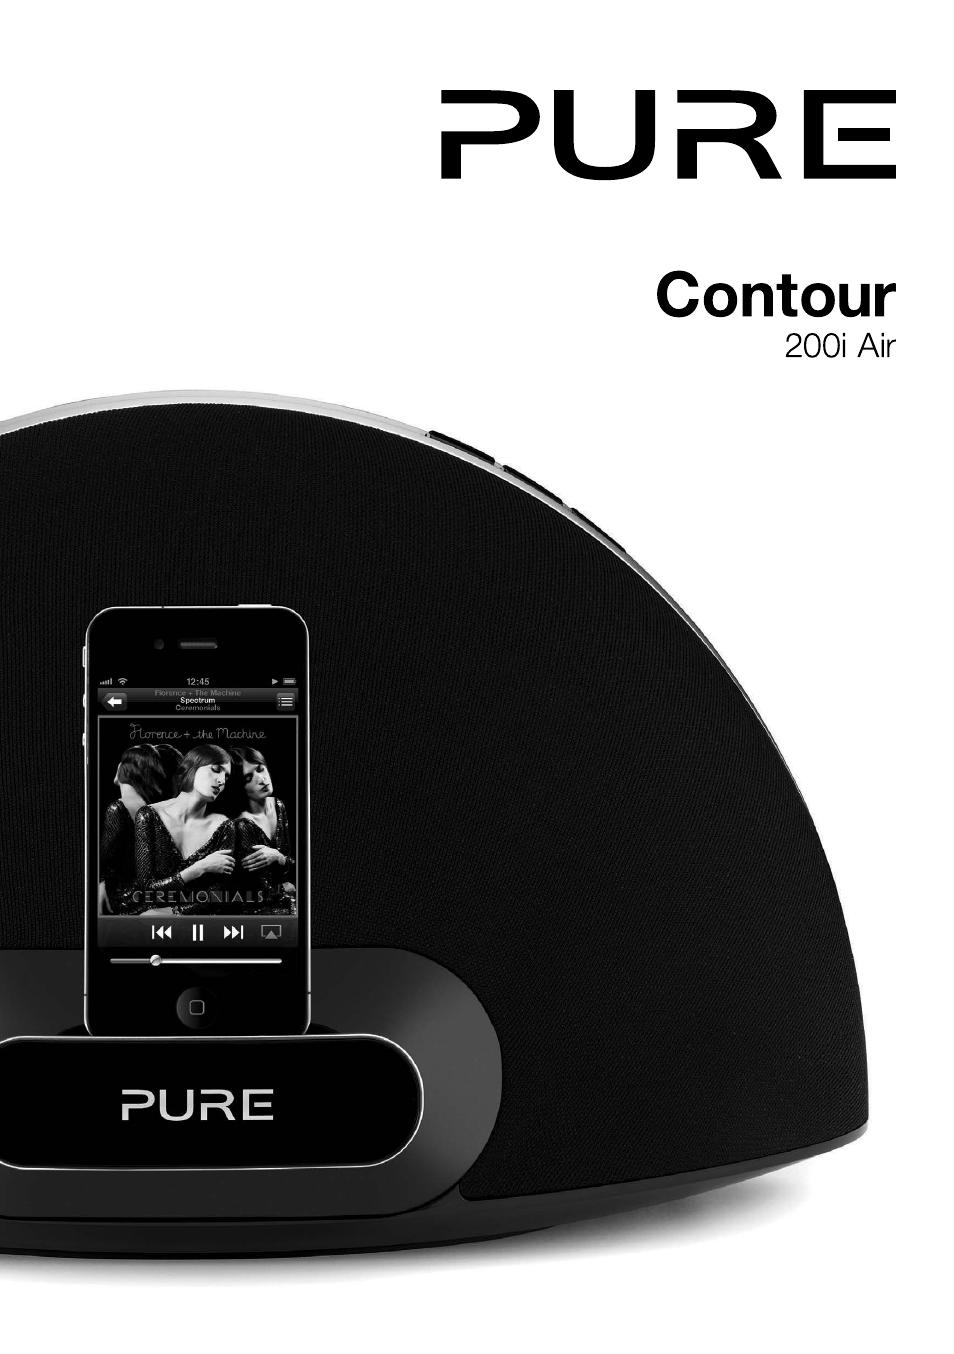 pure contour 200i air user manual 28 pages rh manualsdir com Pure Contour Drawing Shoes Pure Dual Contour Pillow